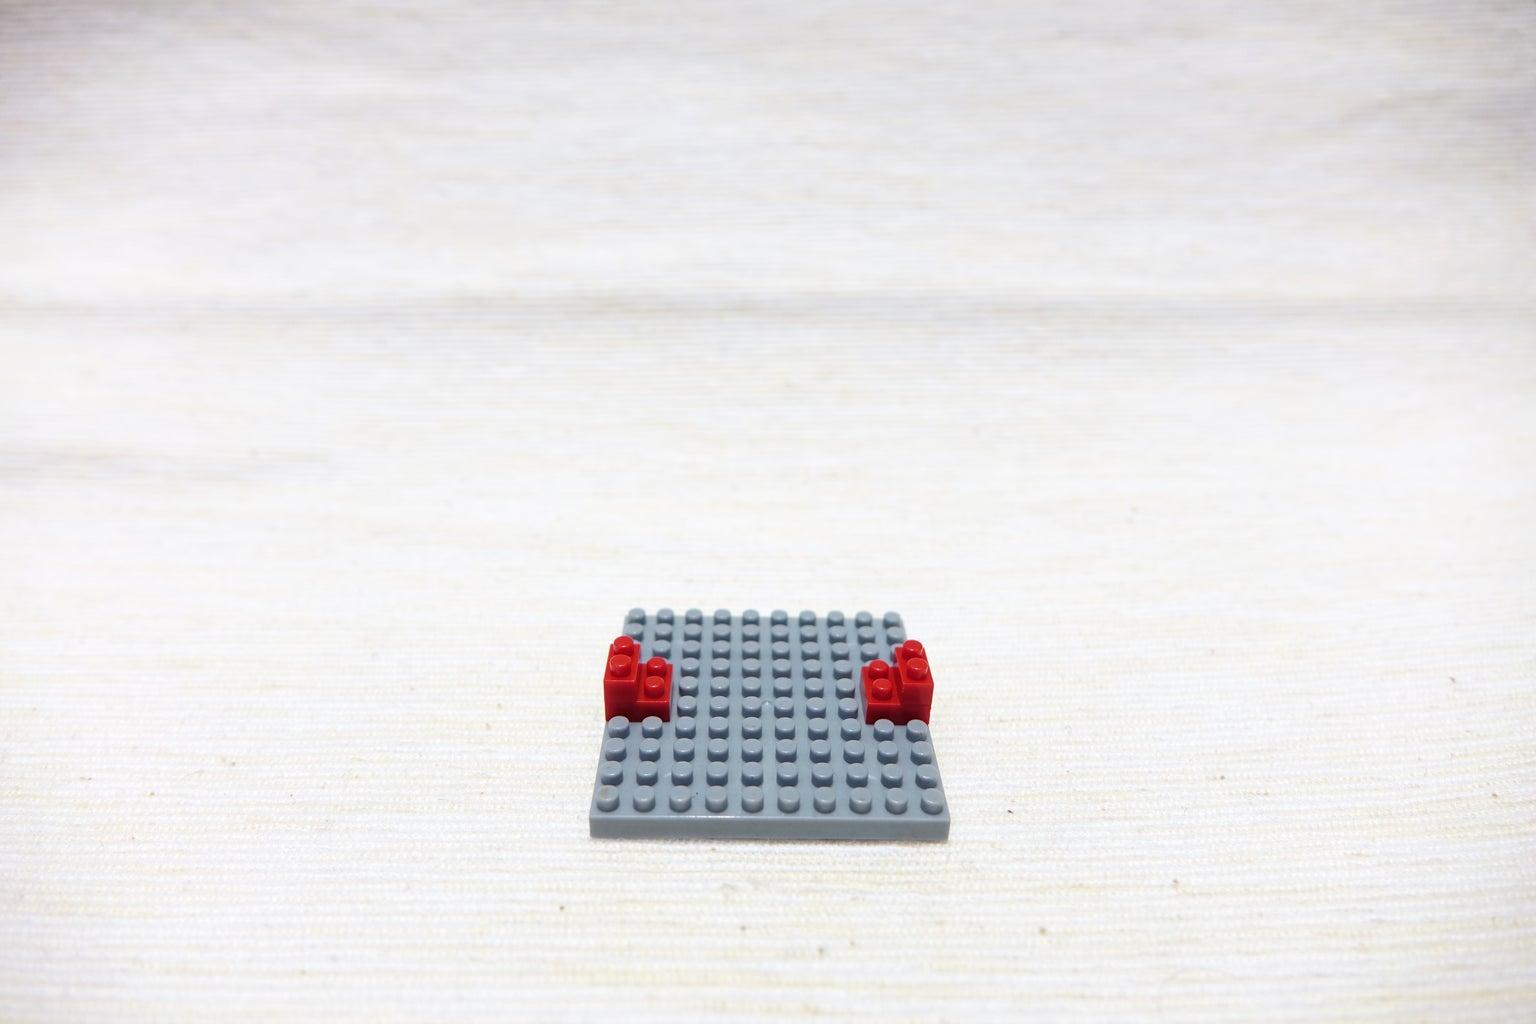 Red Block 1*2, 1*2